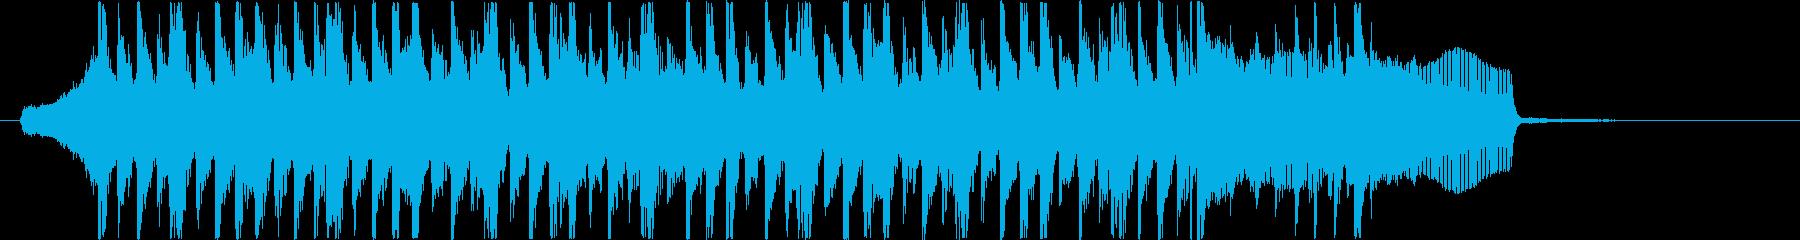 ElectroPop2・かわいい・ポップの再生済みの波形